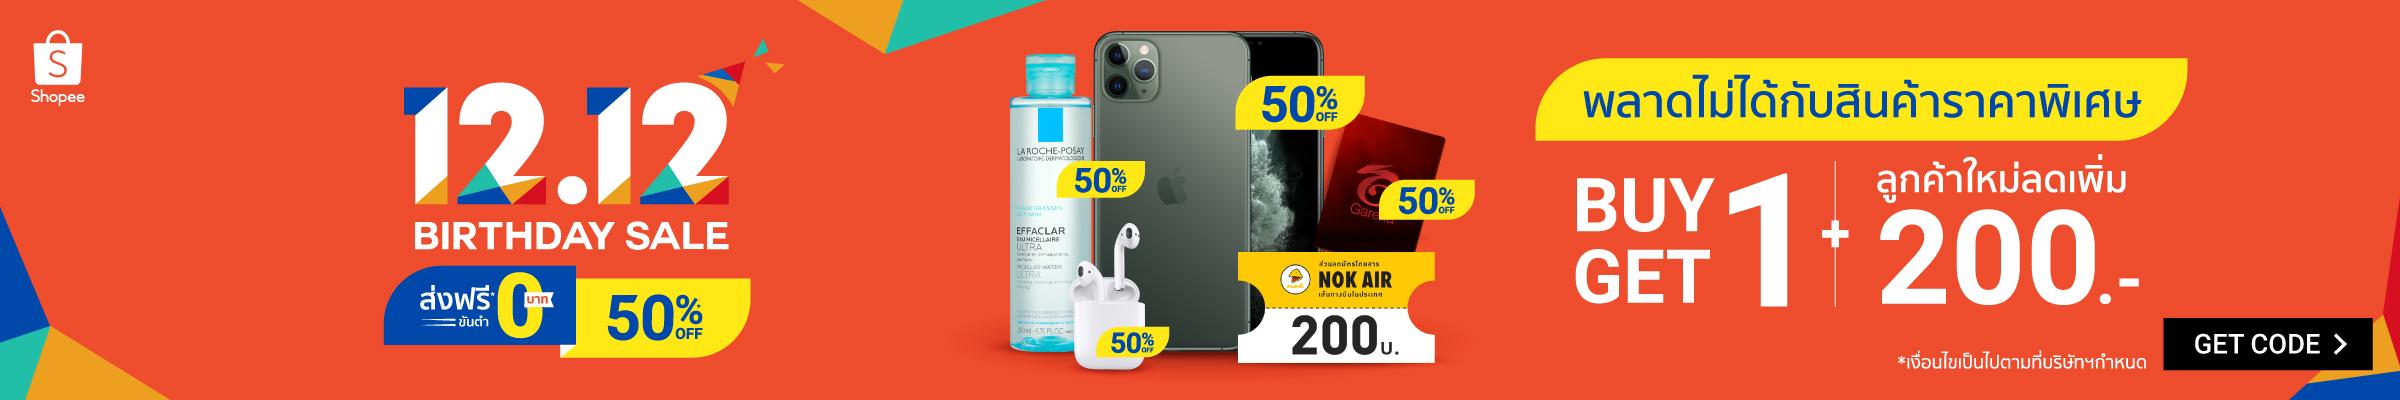 Shopee 50%